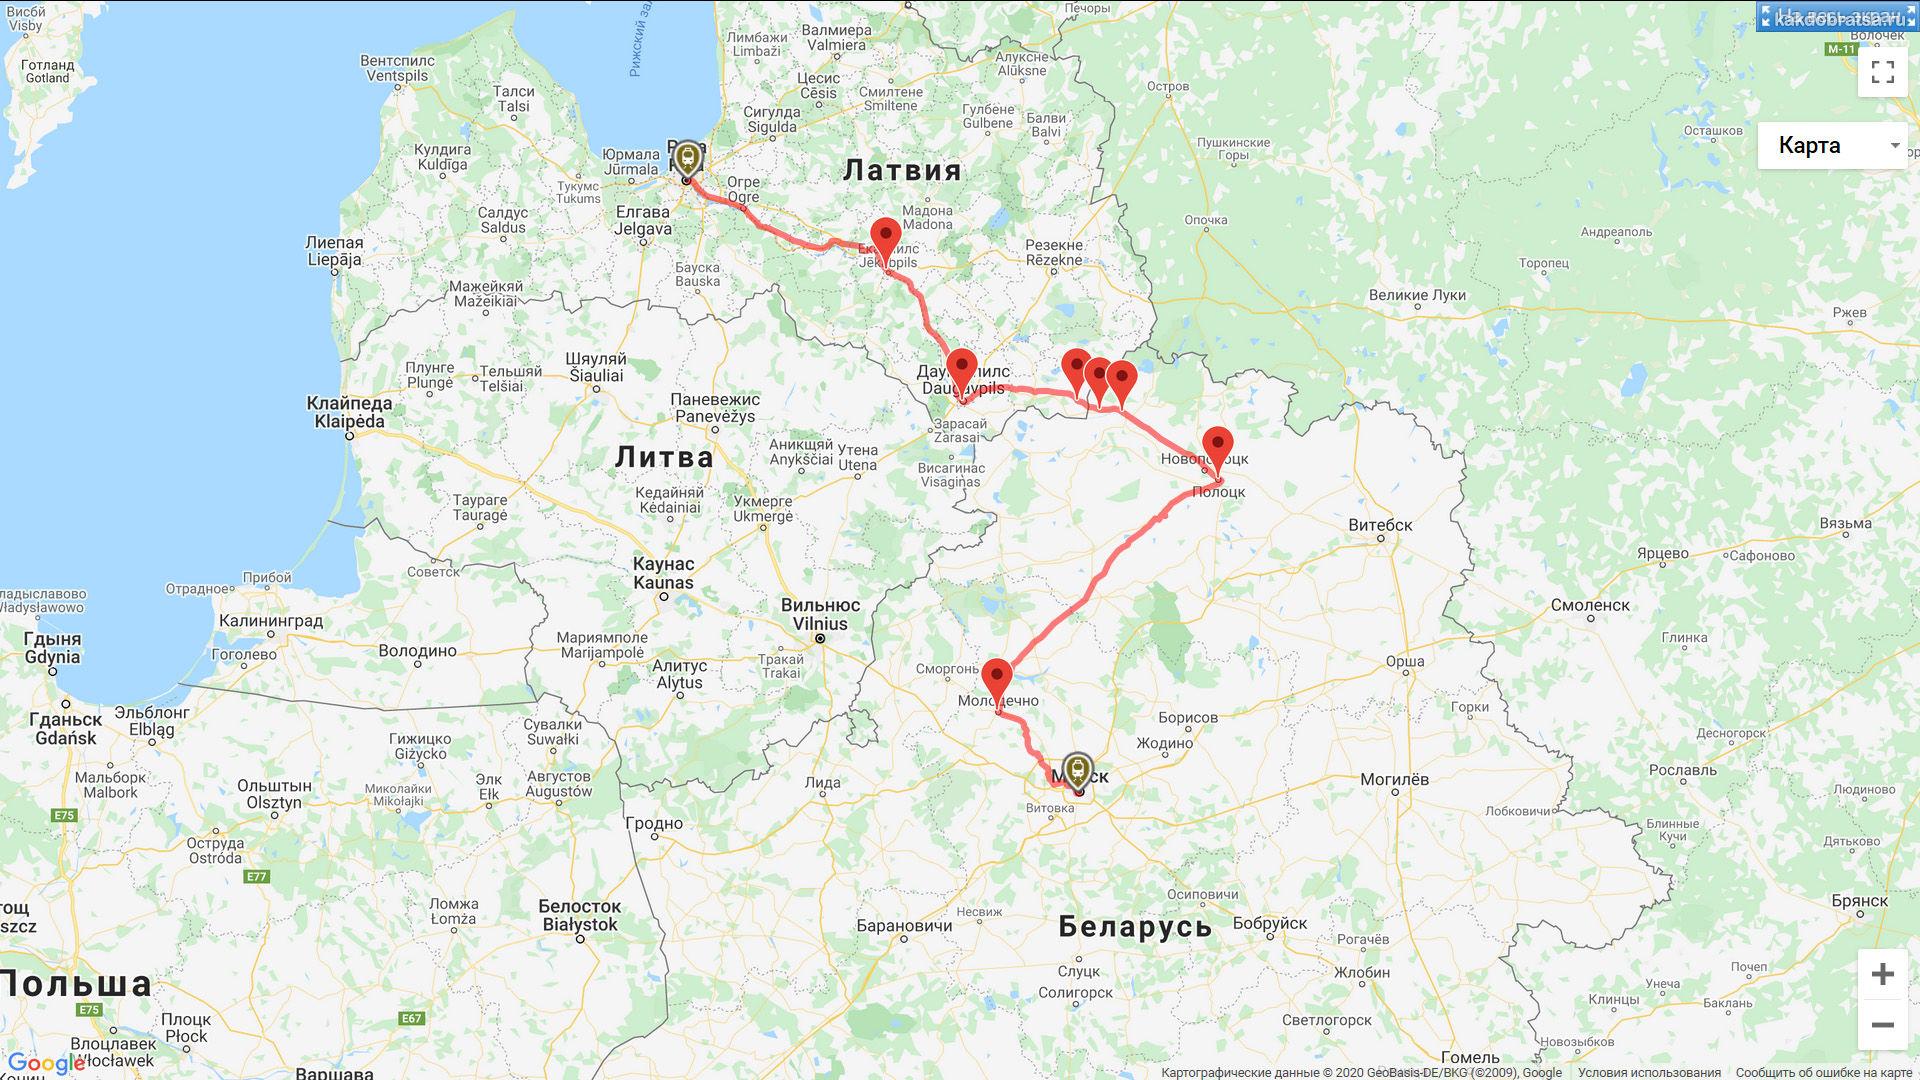 Маршрут поезда из Минска в Ригу